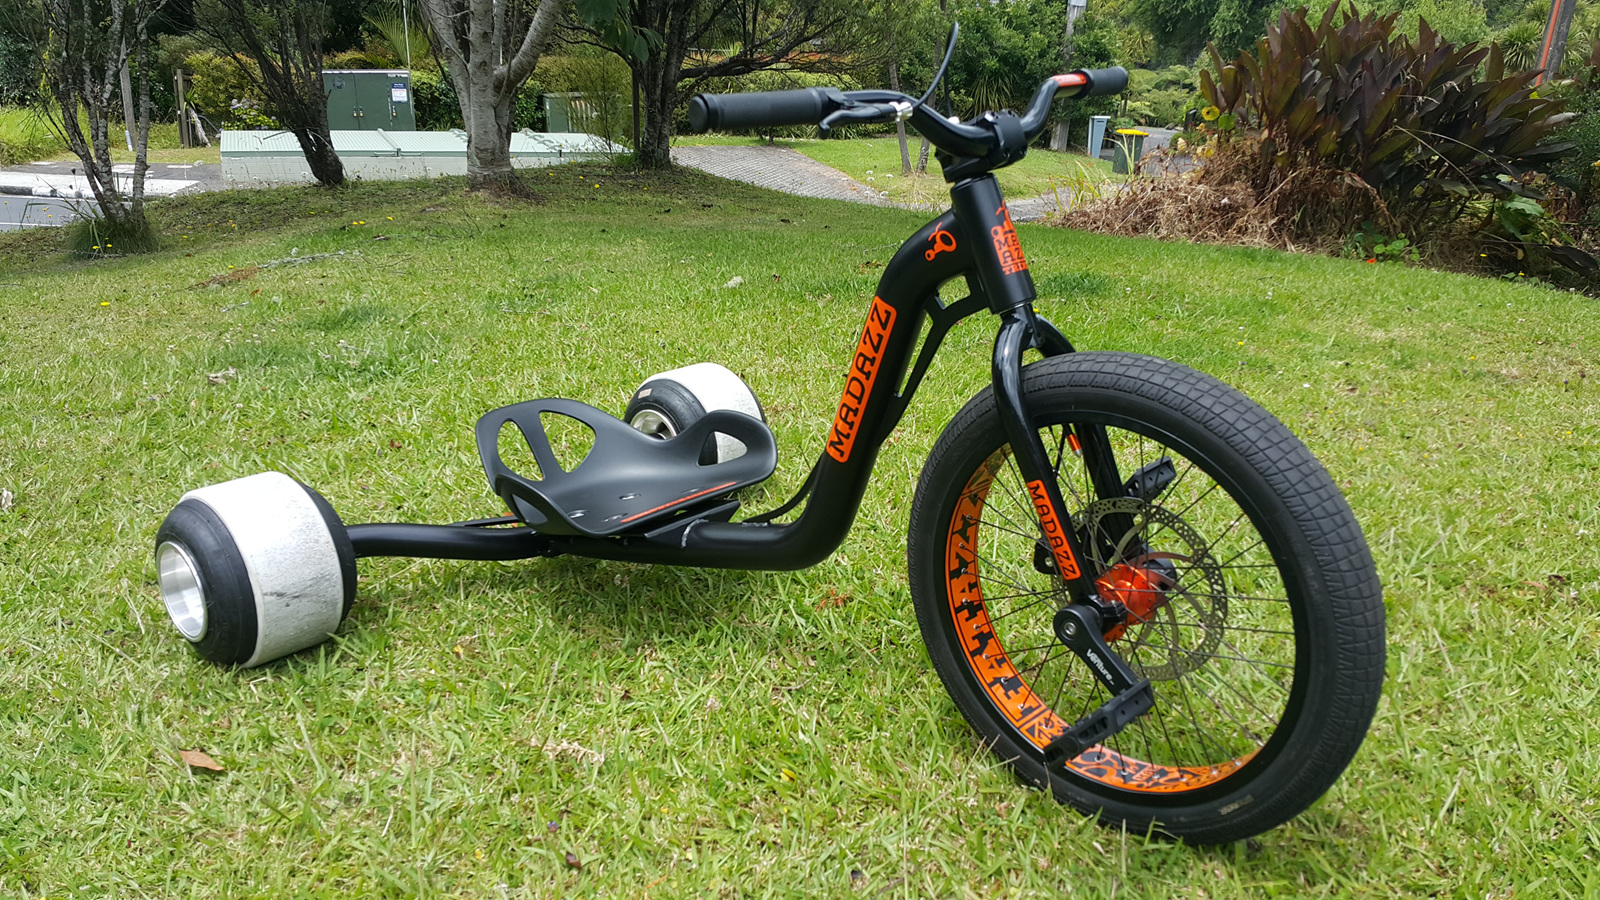 Madazz Spec 5 Pro Drift Trike Madazz Trikes